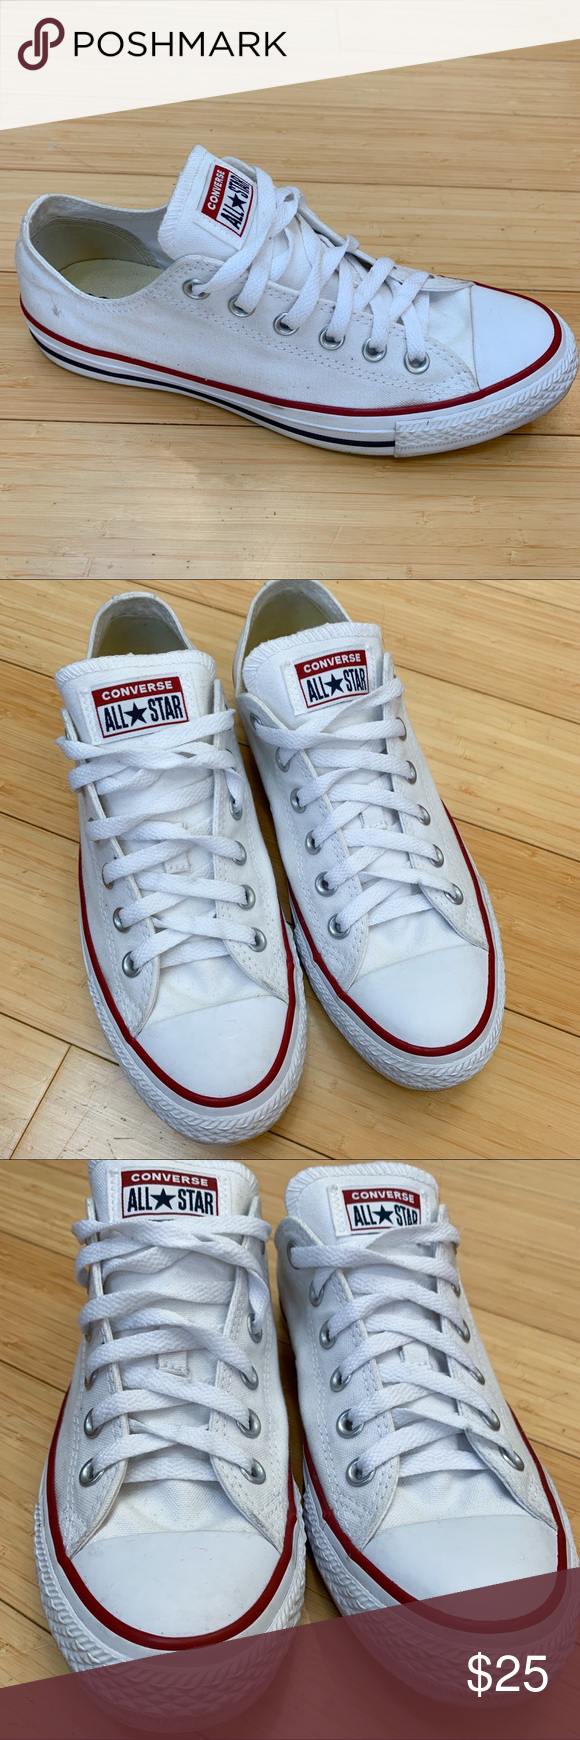 6ec3b0a55df20b CONVERSE All Stars sneakers